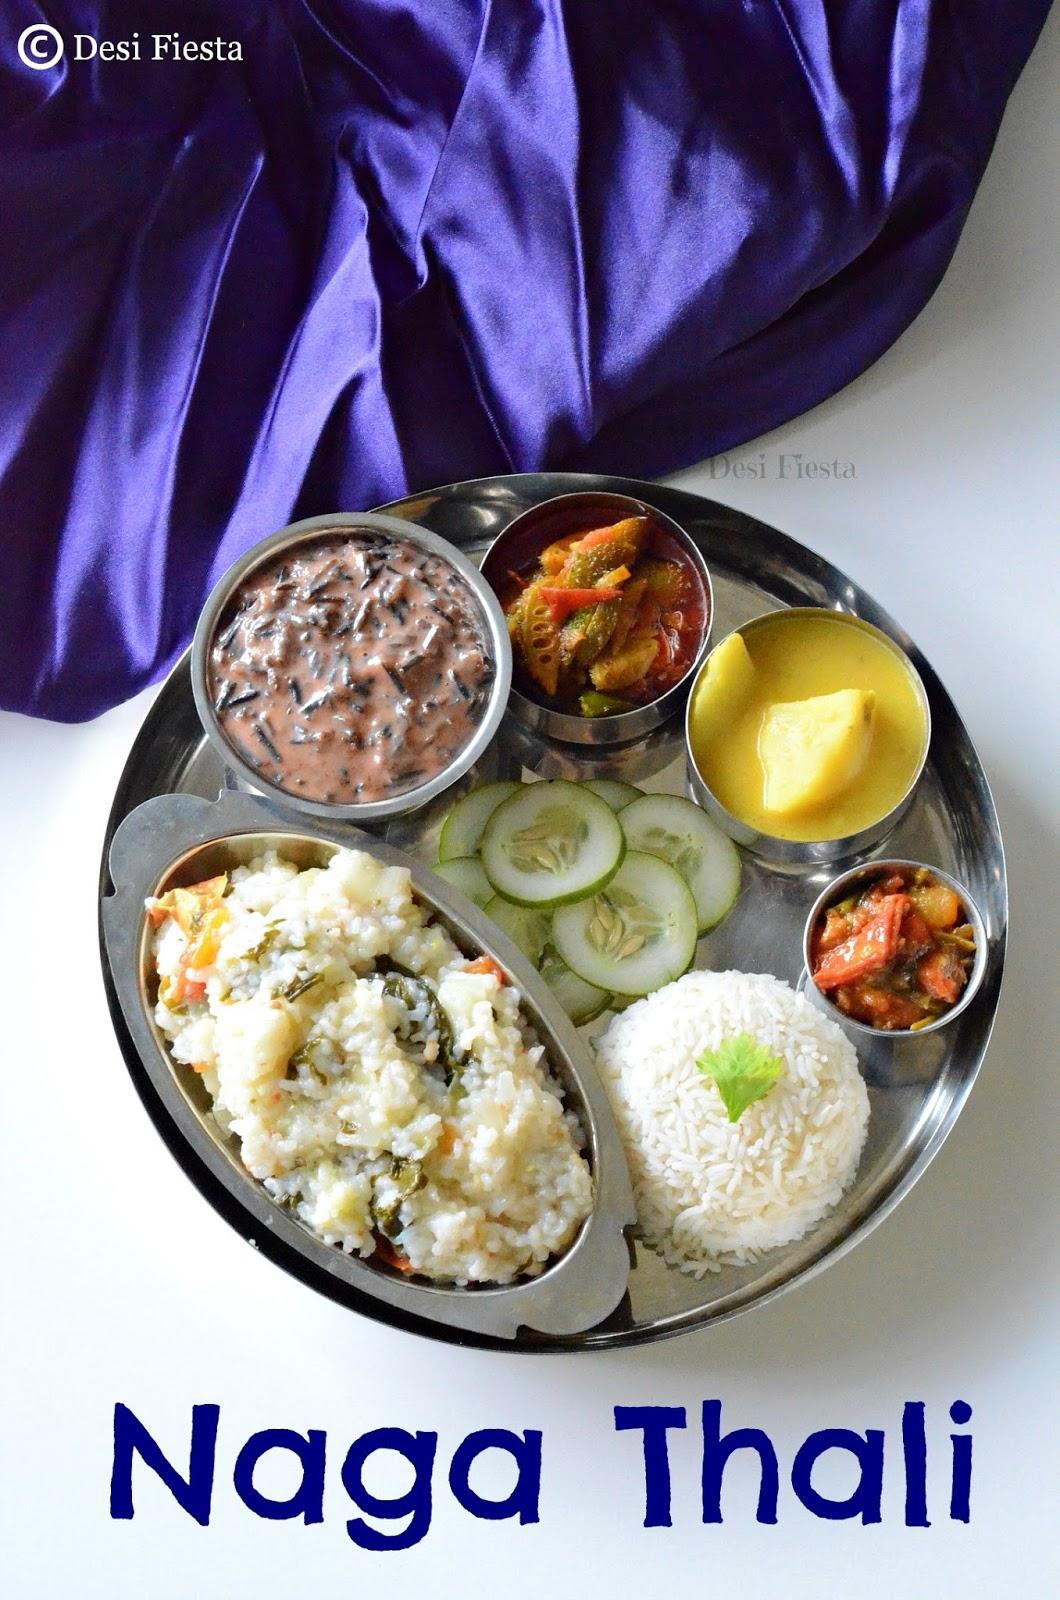 Naga thali nagaland cuisine desi fiesta for Cuisine youtube